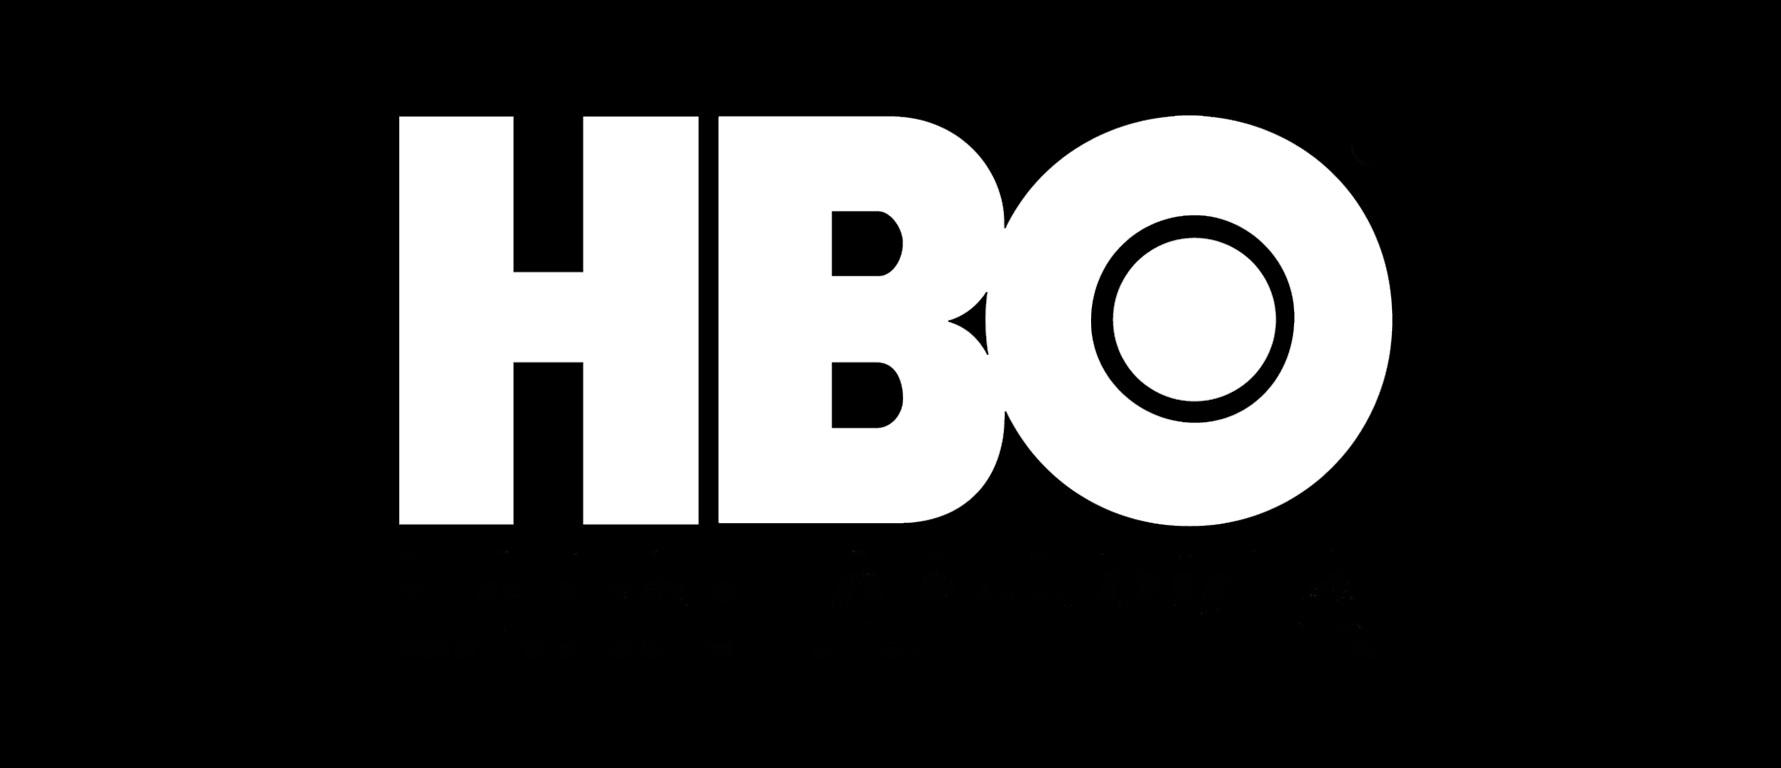 Los mejores trucos para sacar partido a HBO